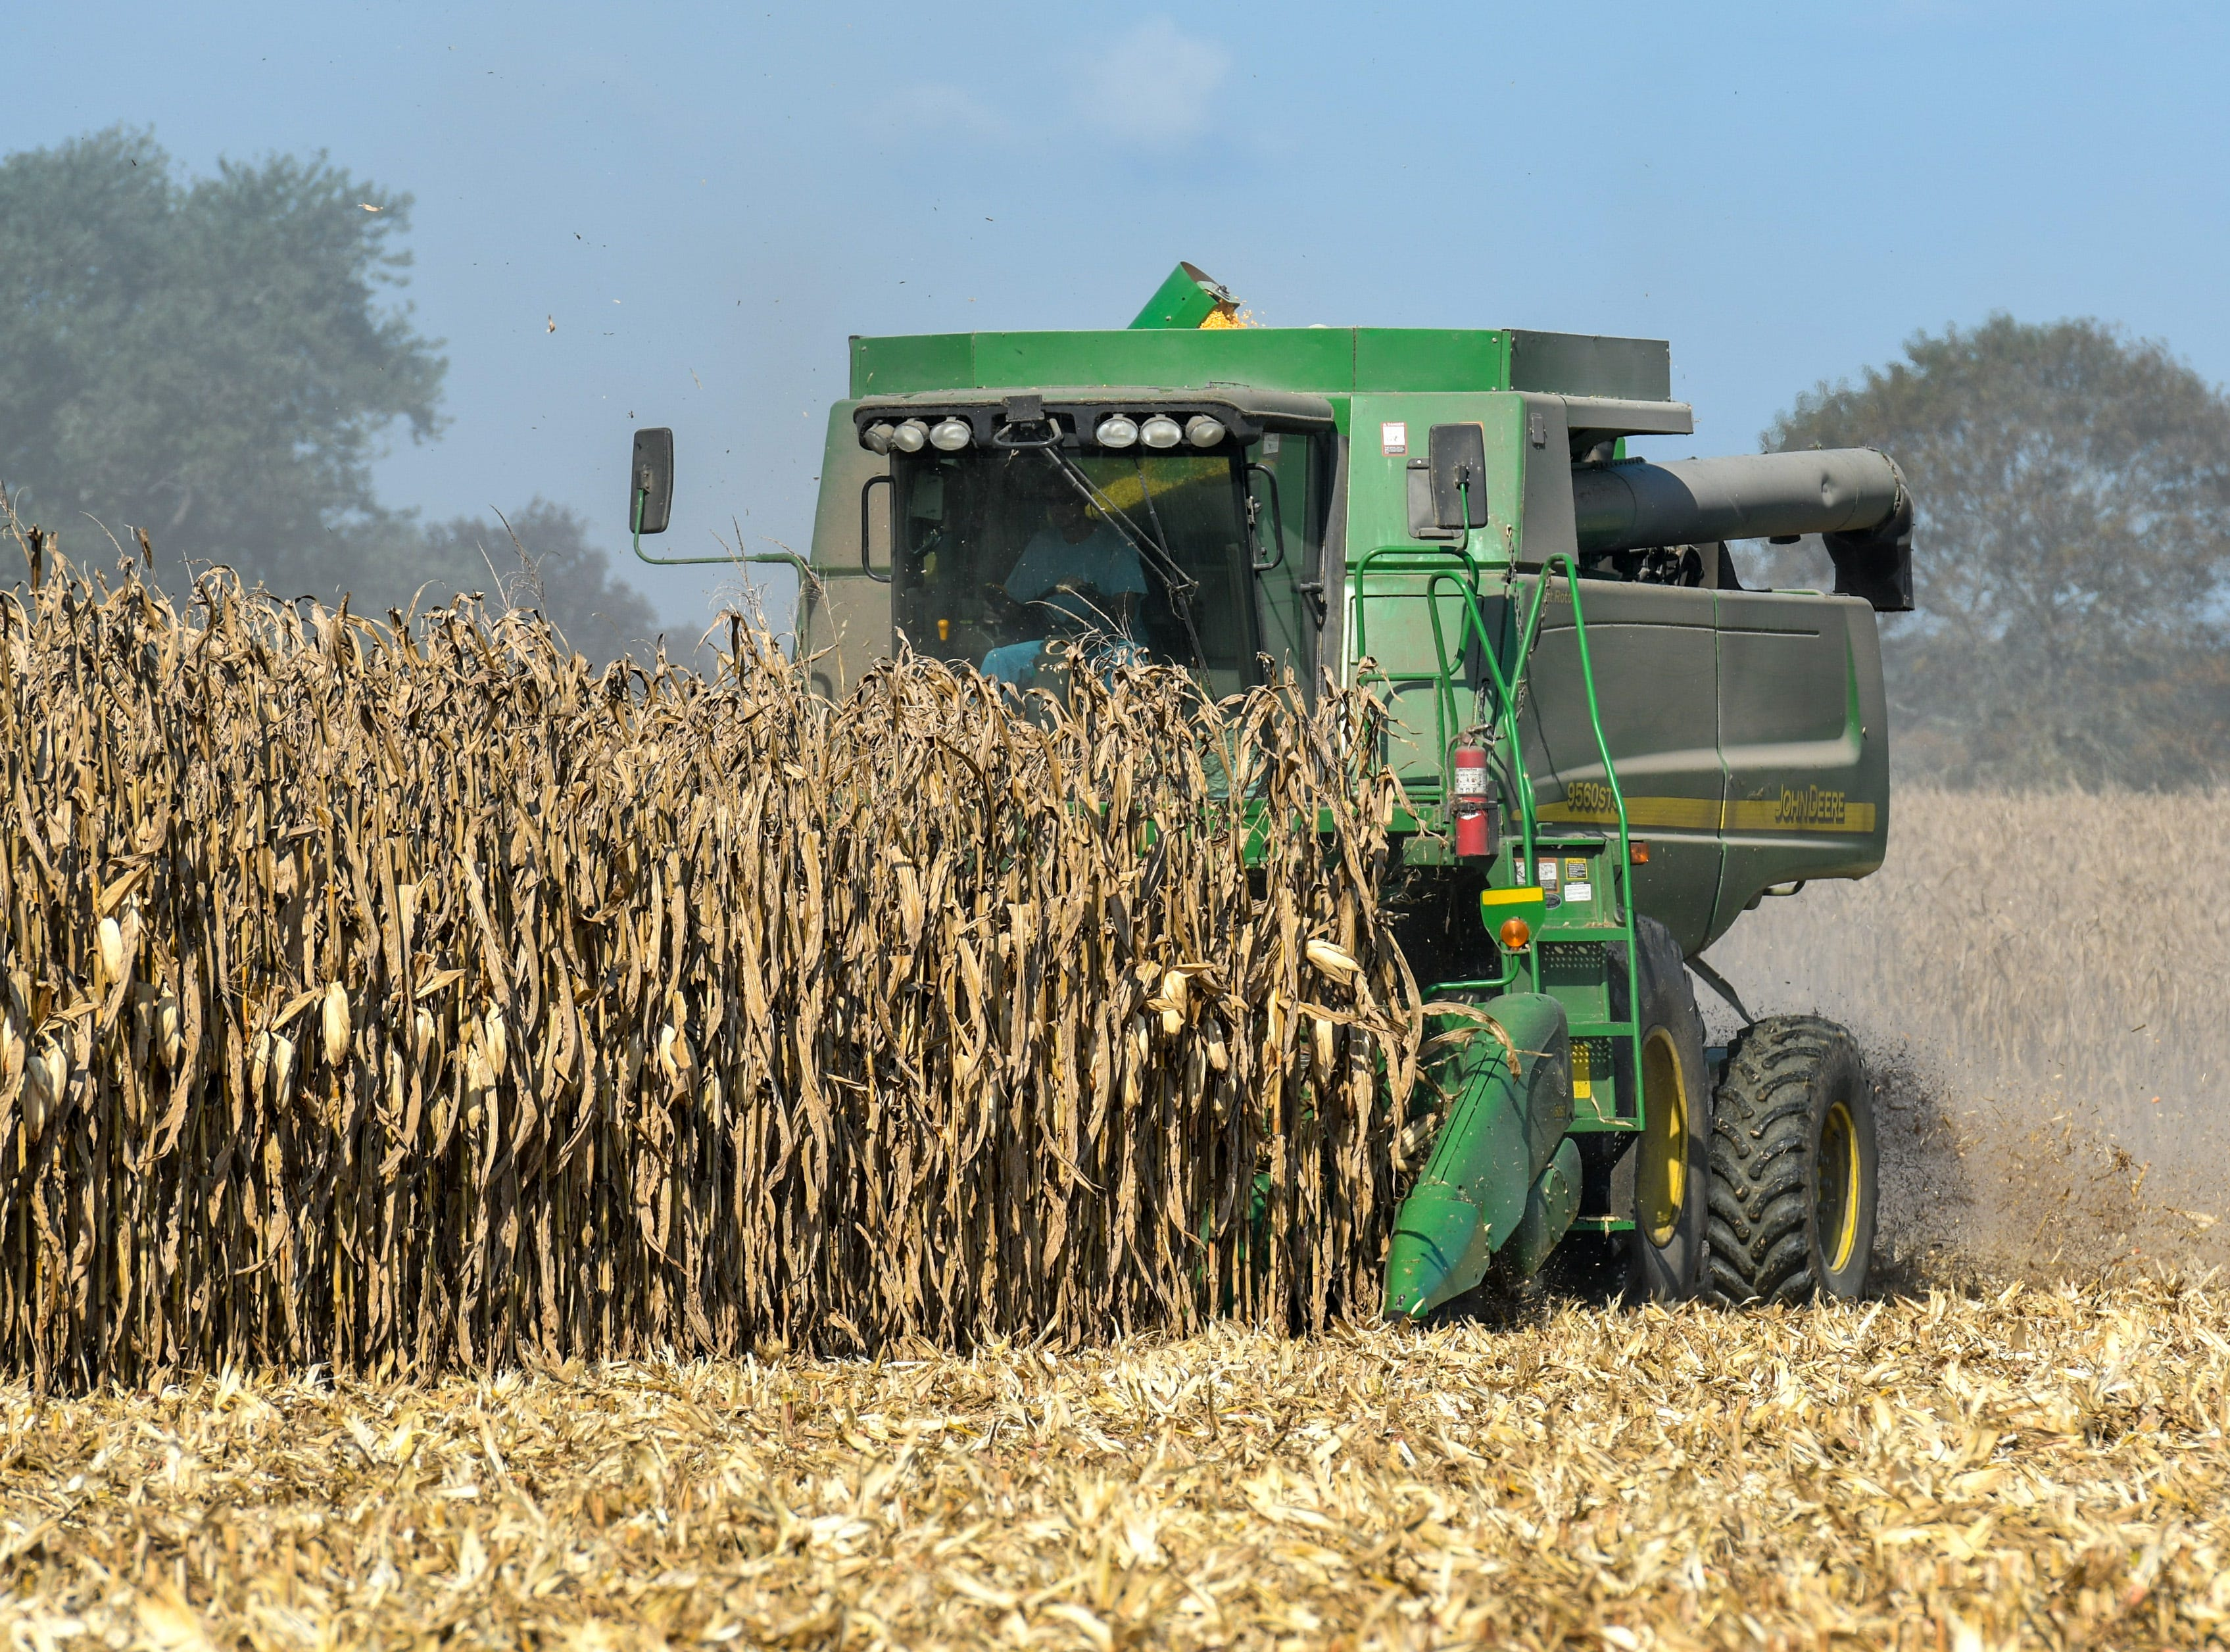 Harris lone Eastern Shore dissent on new $867 billion Farm Bill